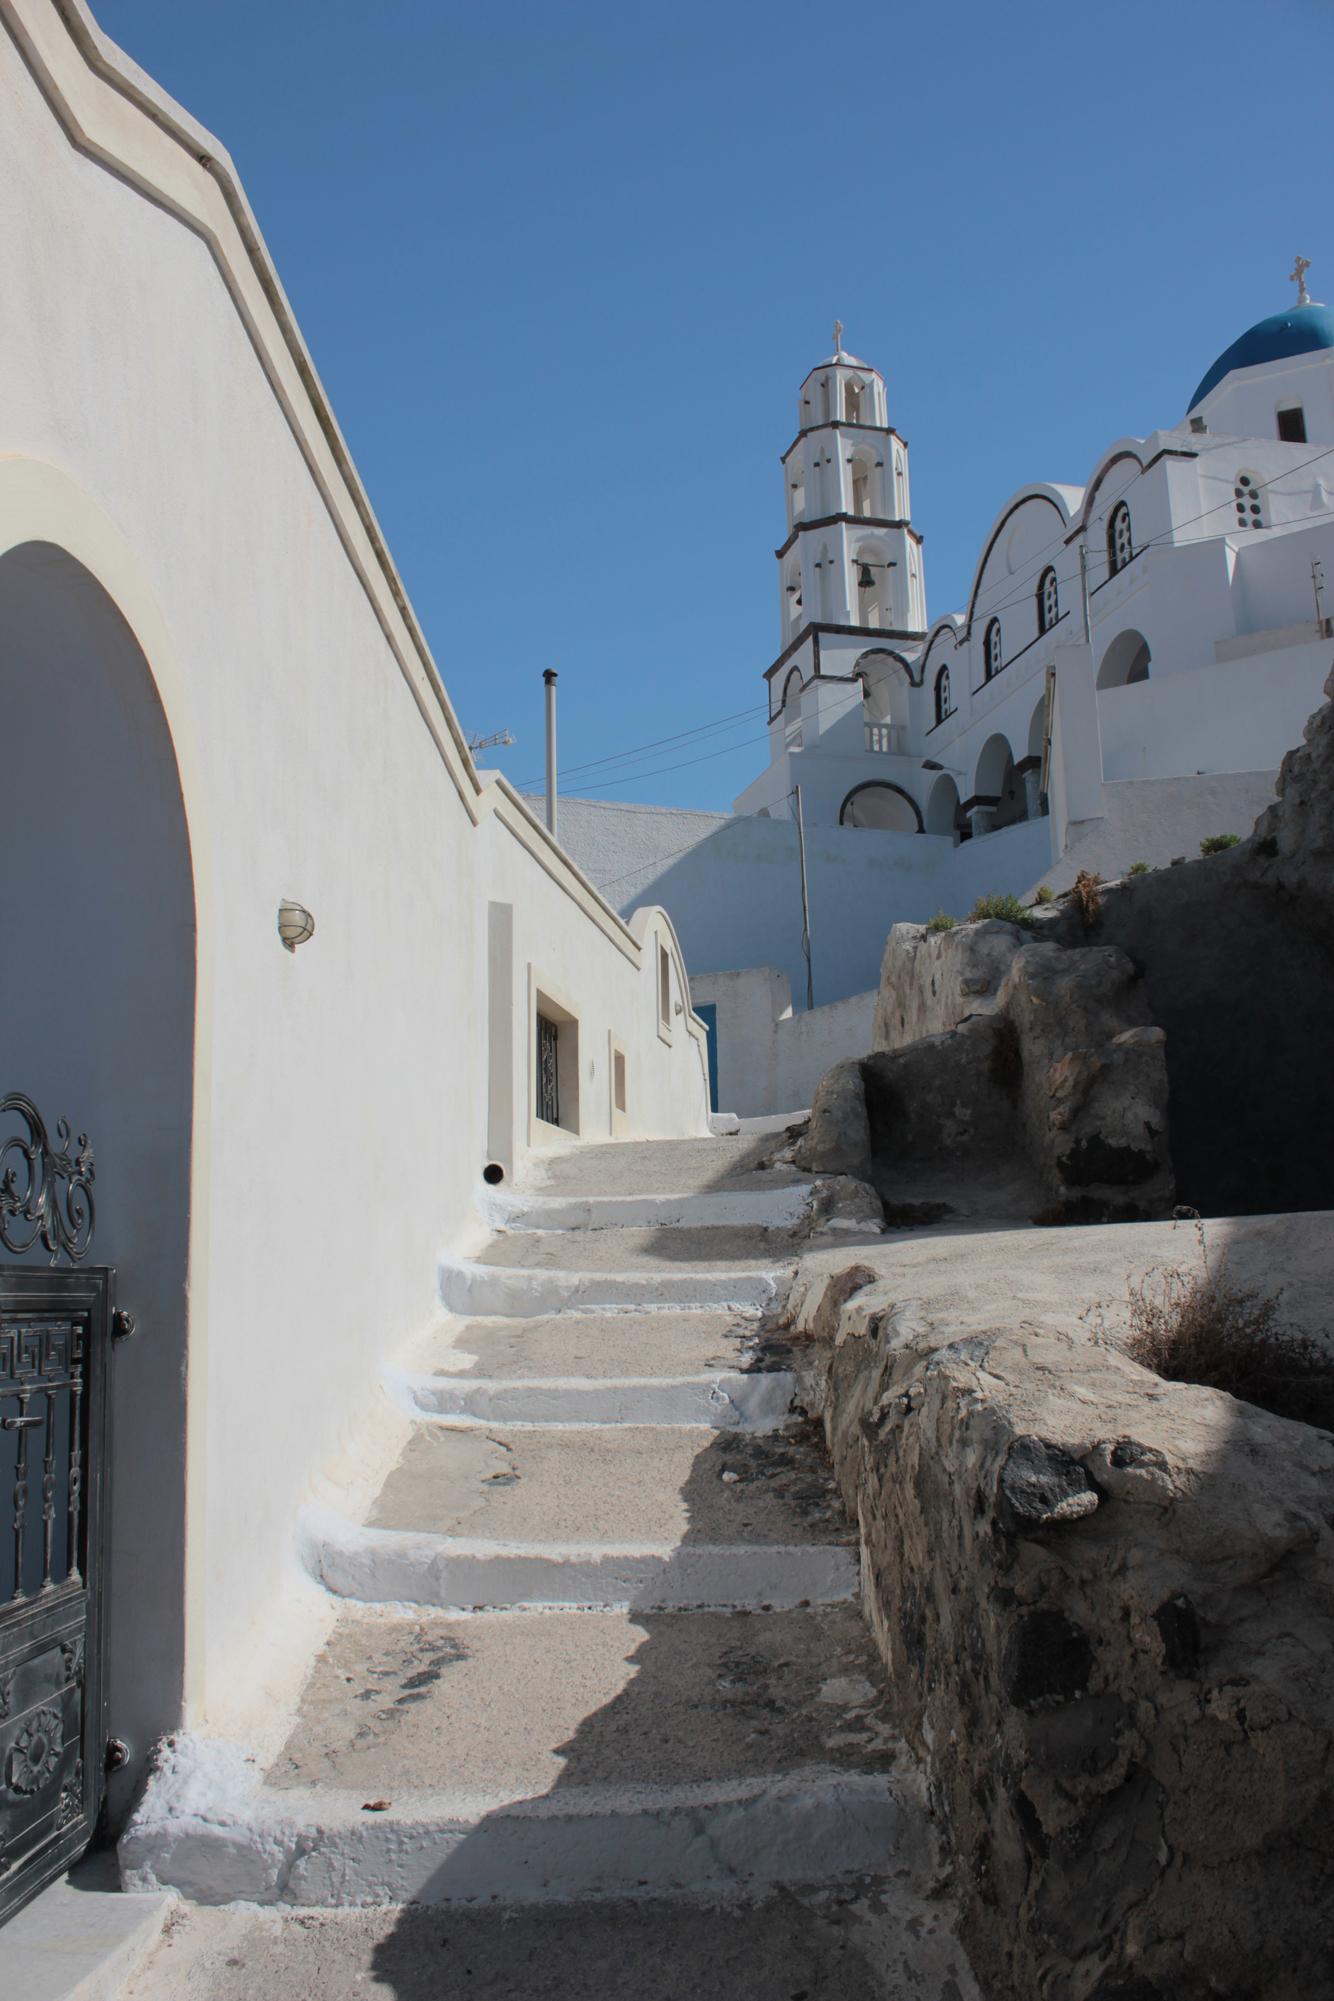 File:A-street-in-old-Pyrgos,-Santorini.jpg - Wikipedia